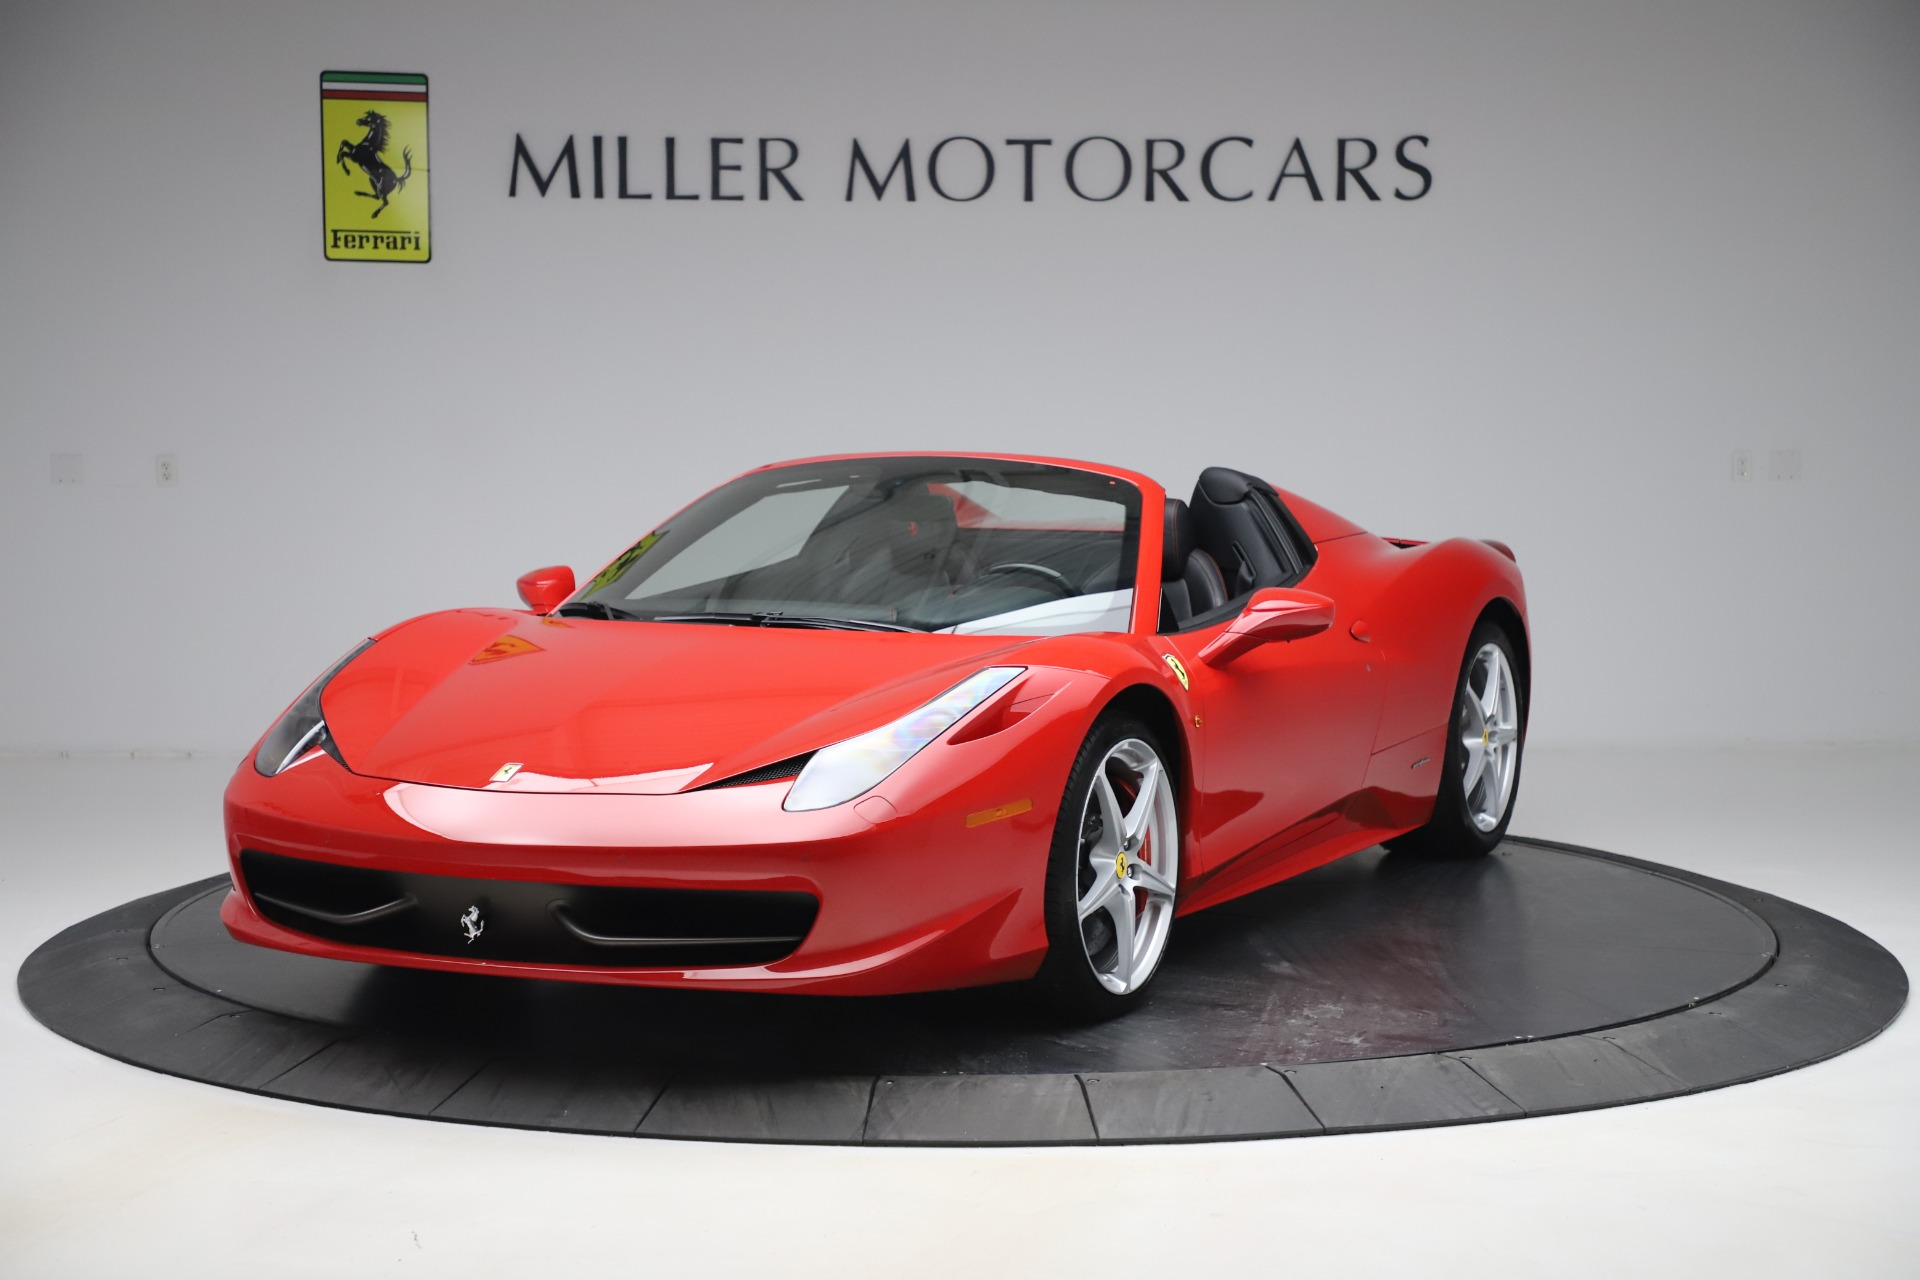 Used 2015 Ferrari 458 Spider for sale Sold at Alfa Romeo of Westport in Westport CT 06880 1